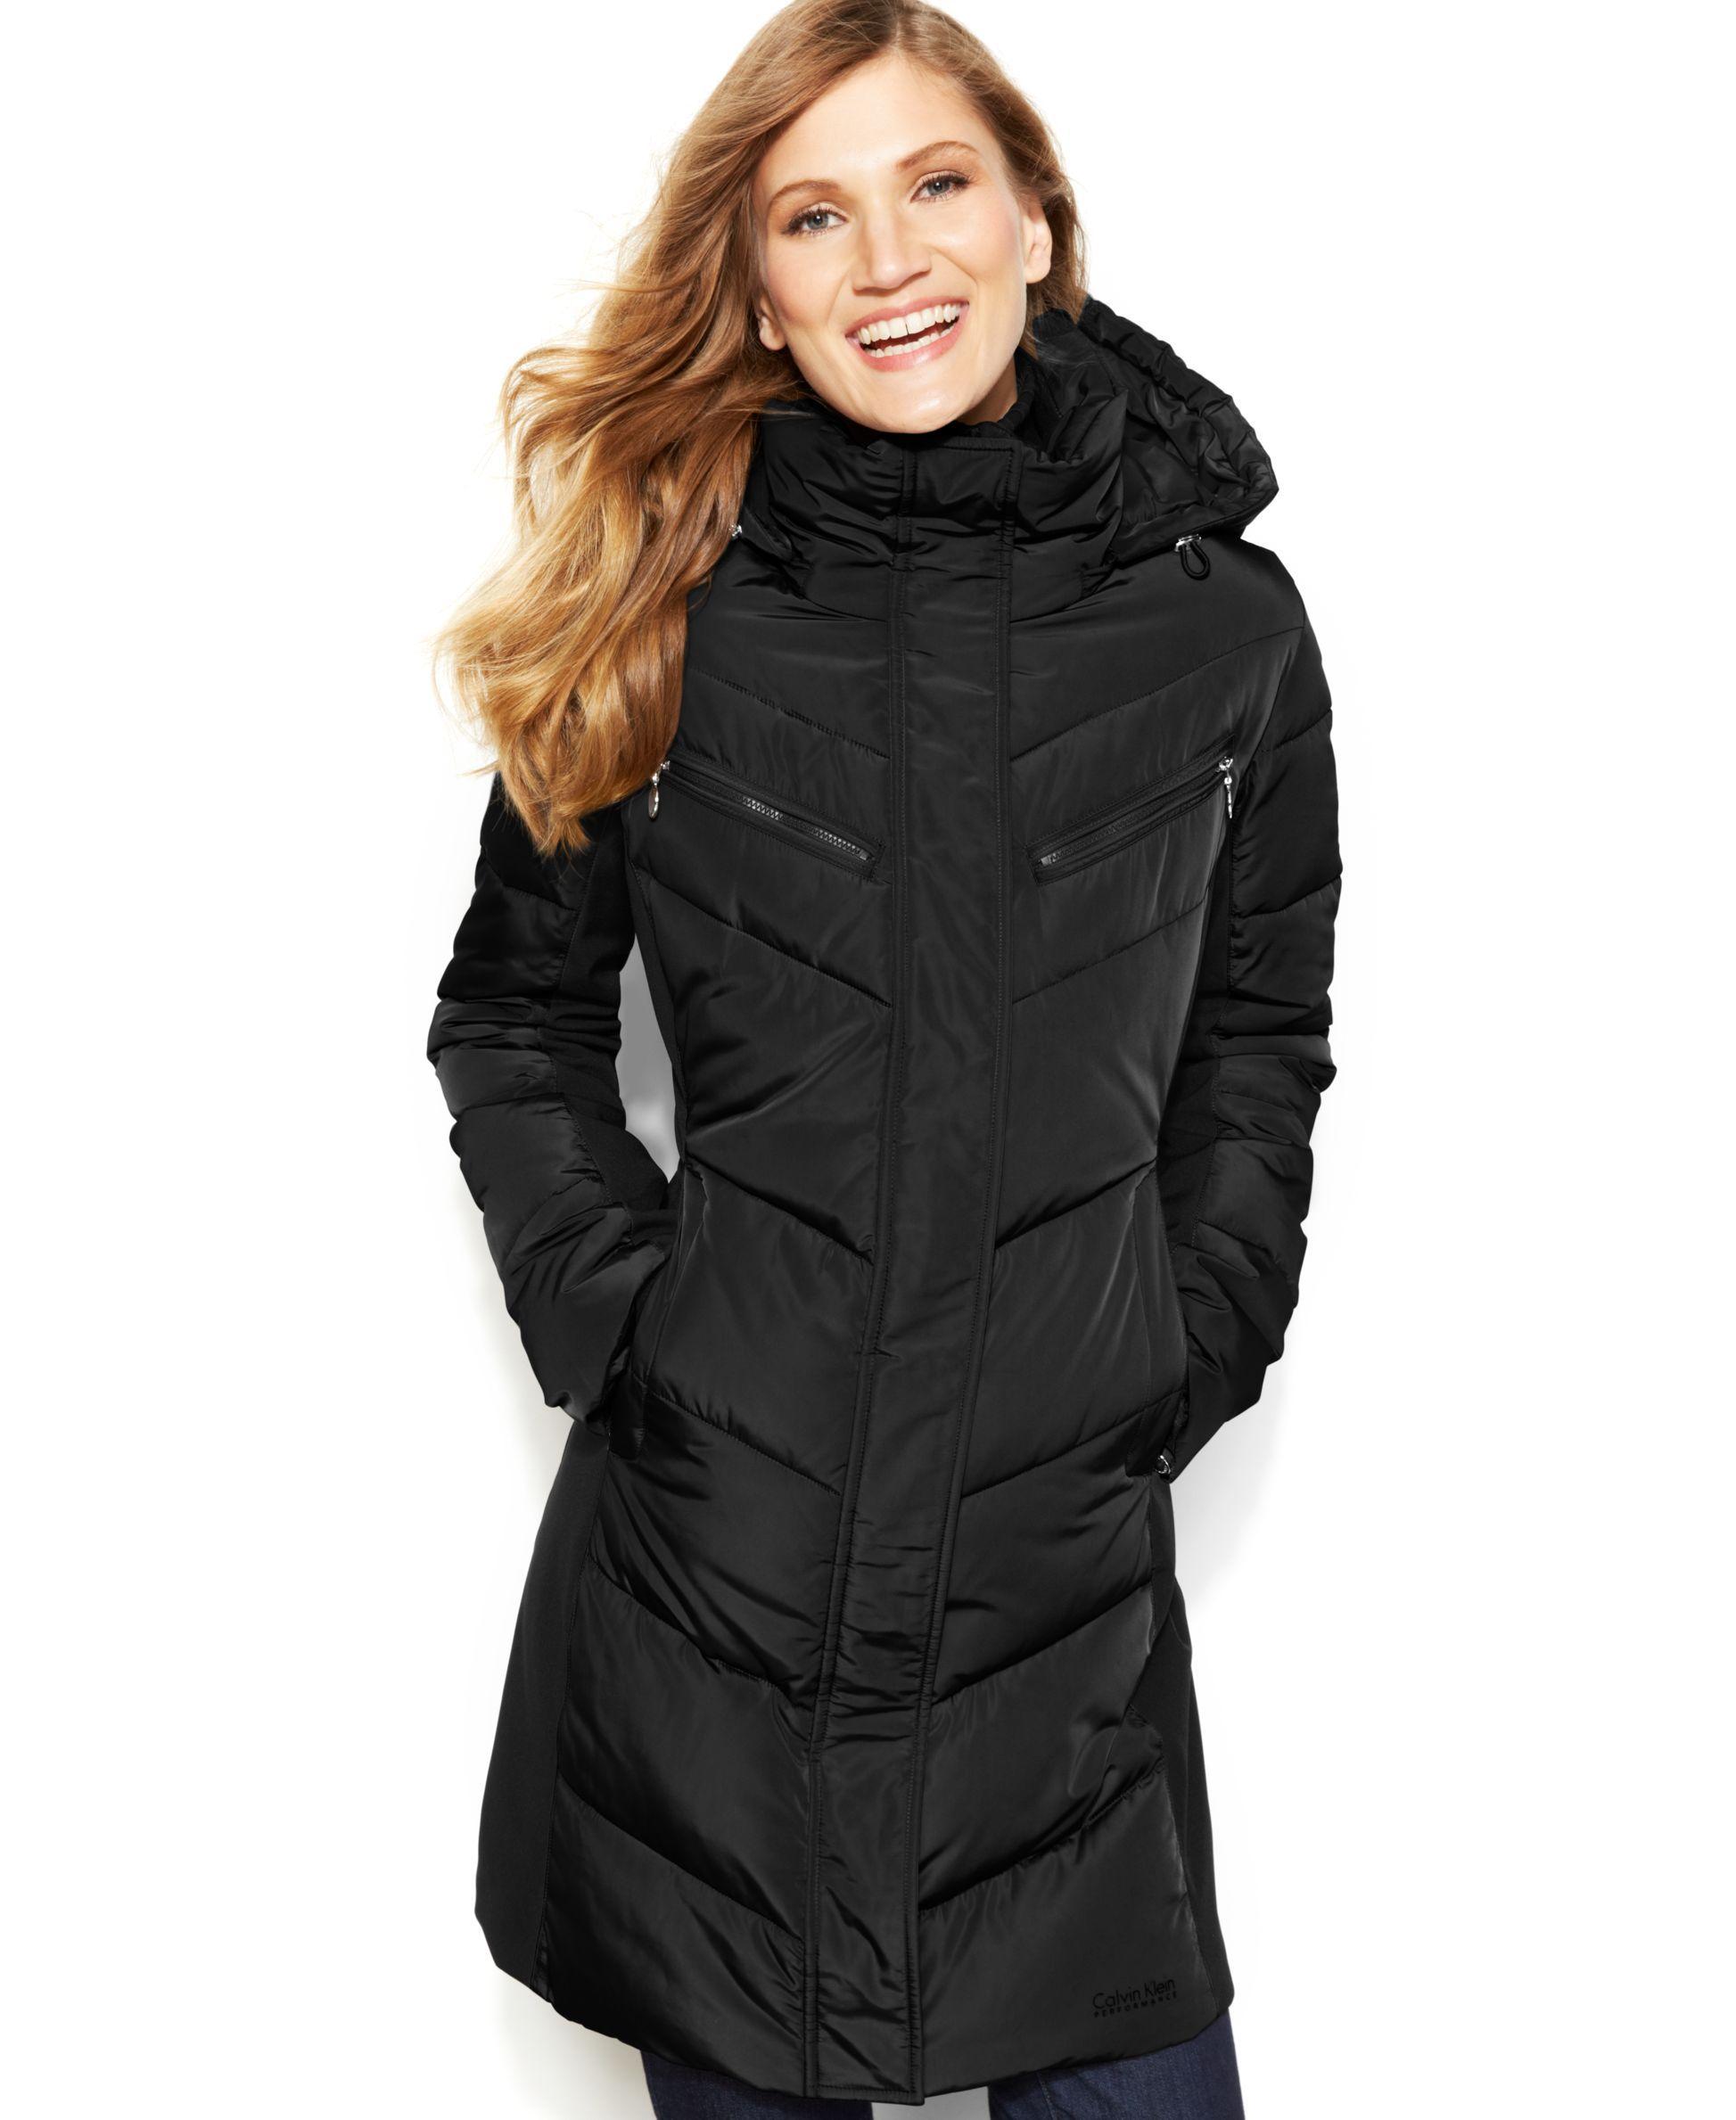 Calvin Klein Hooded Quilted Colorblock Puffer Coat Coats Women Macy S Puffer Coat Coats For Women Fashion [ 2378 x 1947 Pixel ]